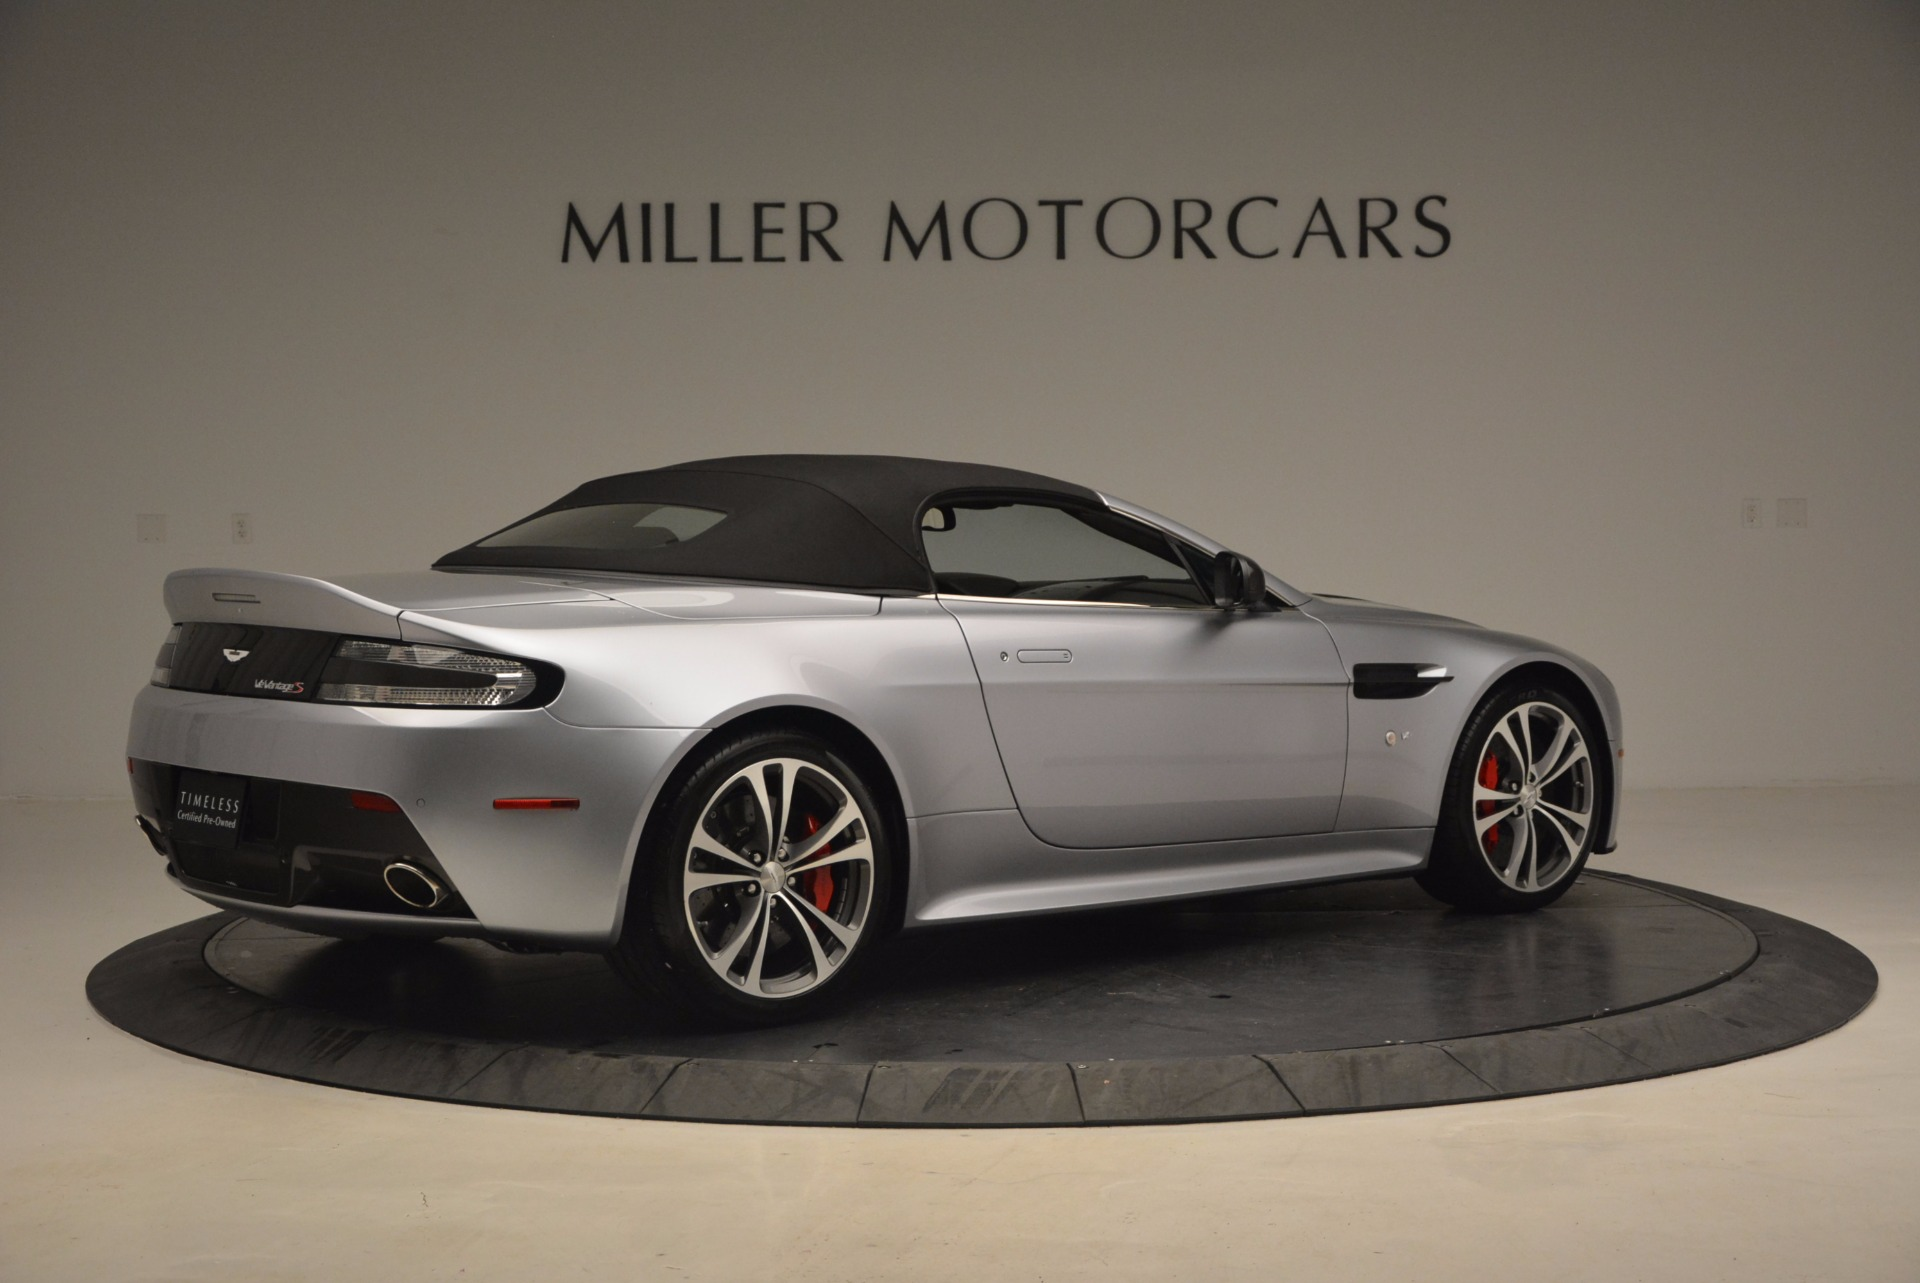 Pre Owned 2015 Aston Martin V12 Vantage S Roadster For Sale Miller Motorcars Stock 7823